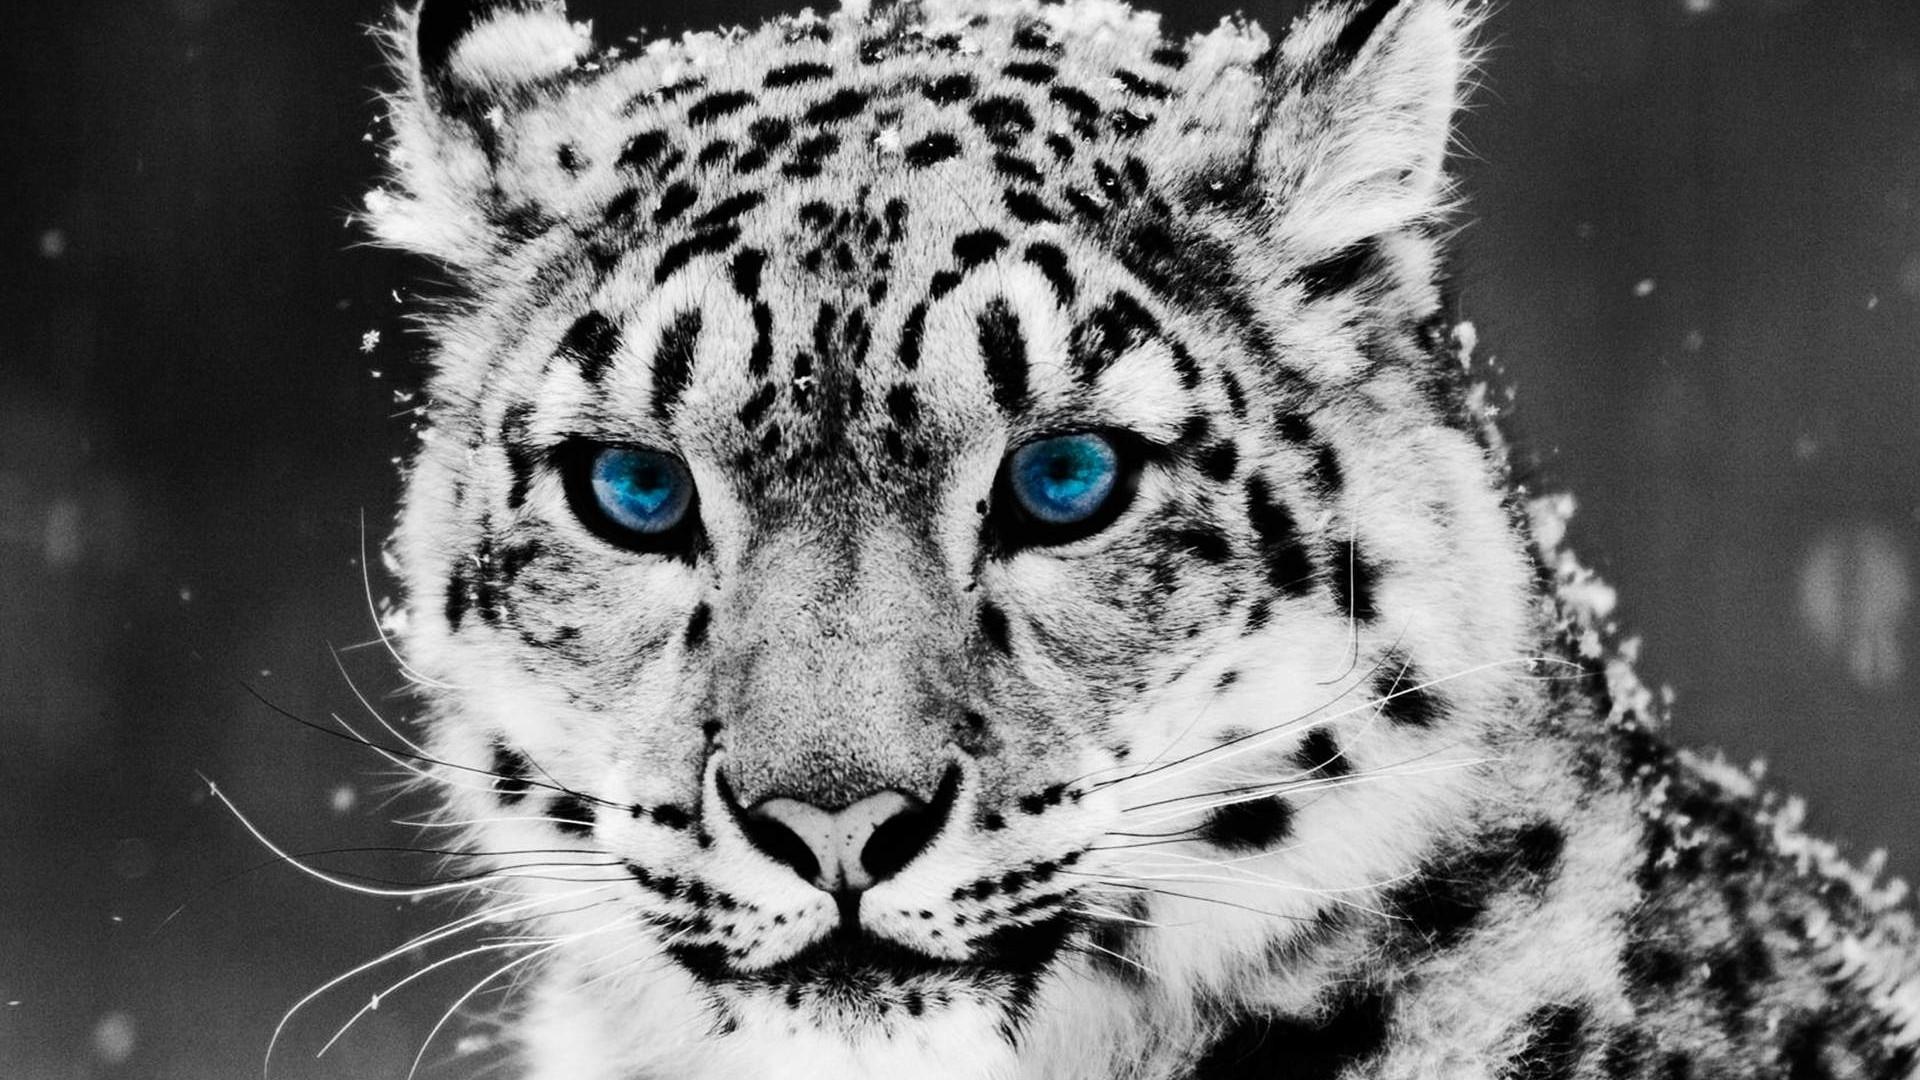 Drawn snow walpaper Leopard WallpaperSafari Contribute to Story:Download